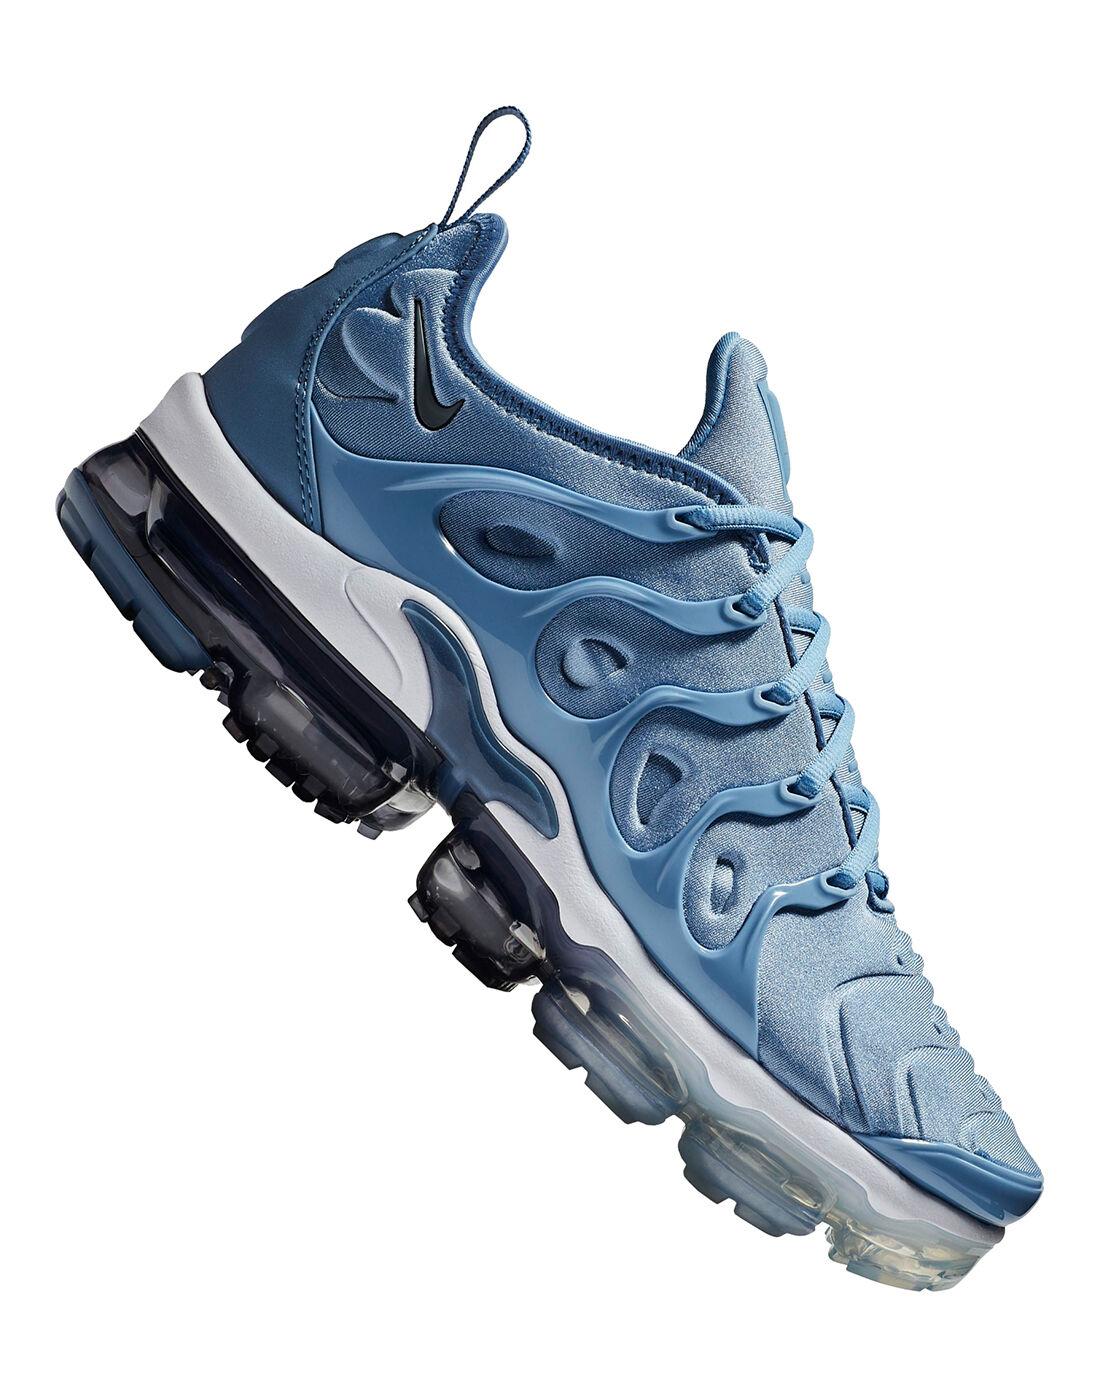 Men's Blue Nike Air VaporMax Plus | Life Style Sports